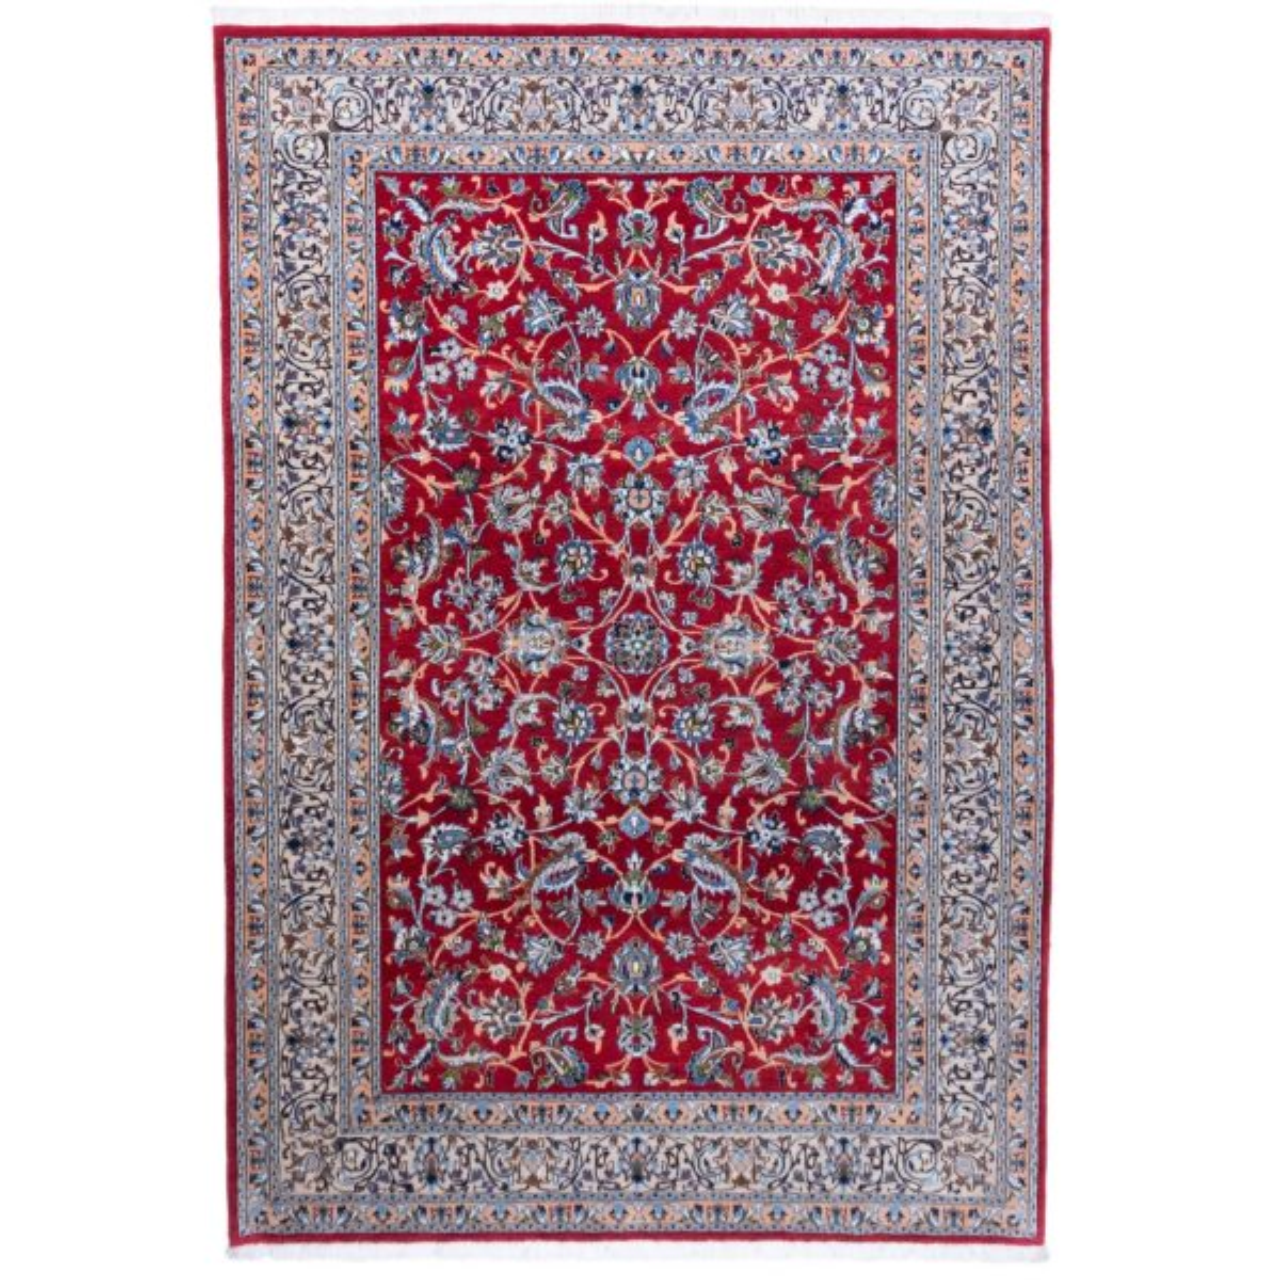 فرش دستباف شش متری سی پرشیا کد 171160